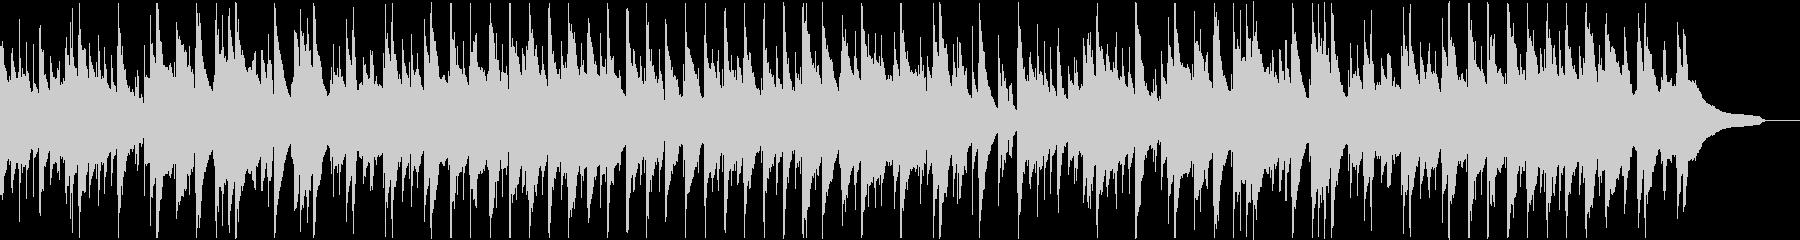 【YouTube】おしゃれなアコギの日常の未再生の波形